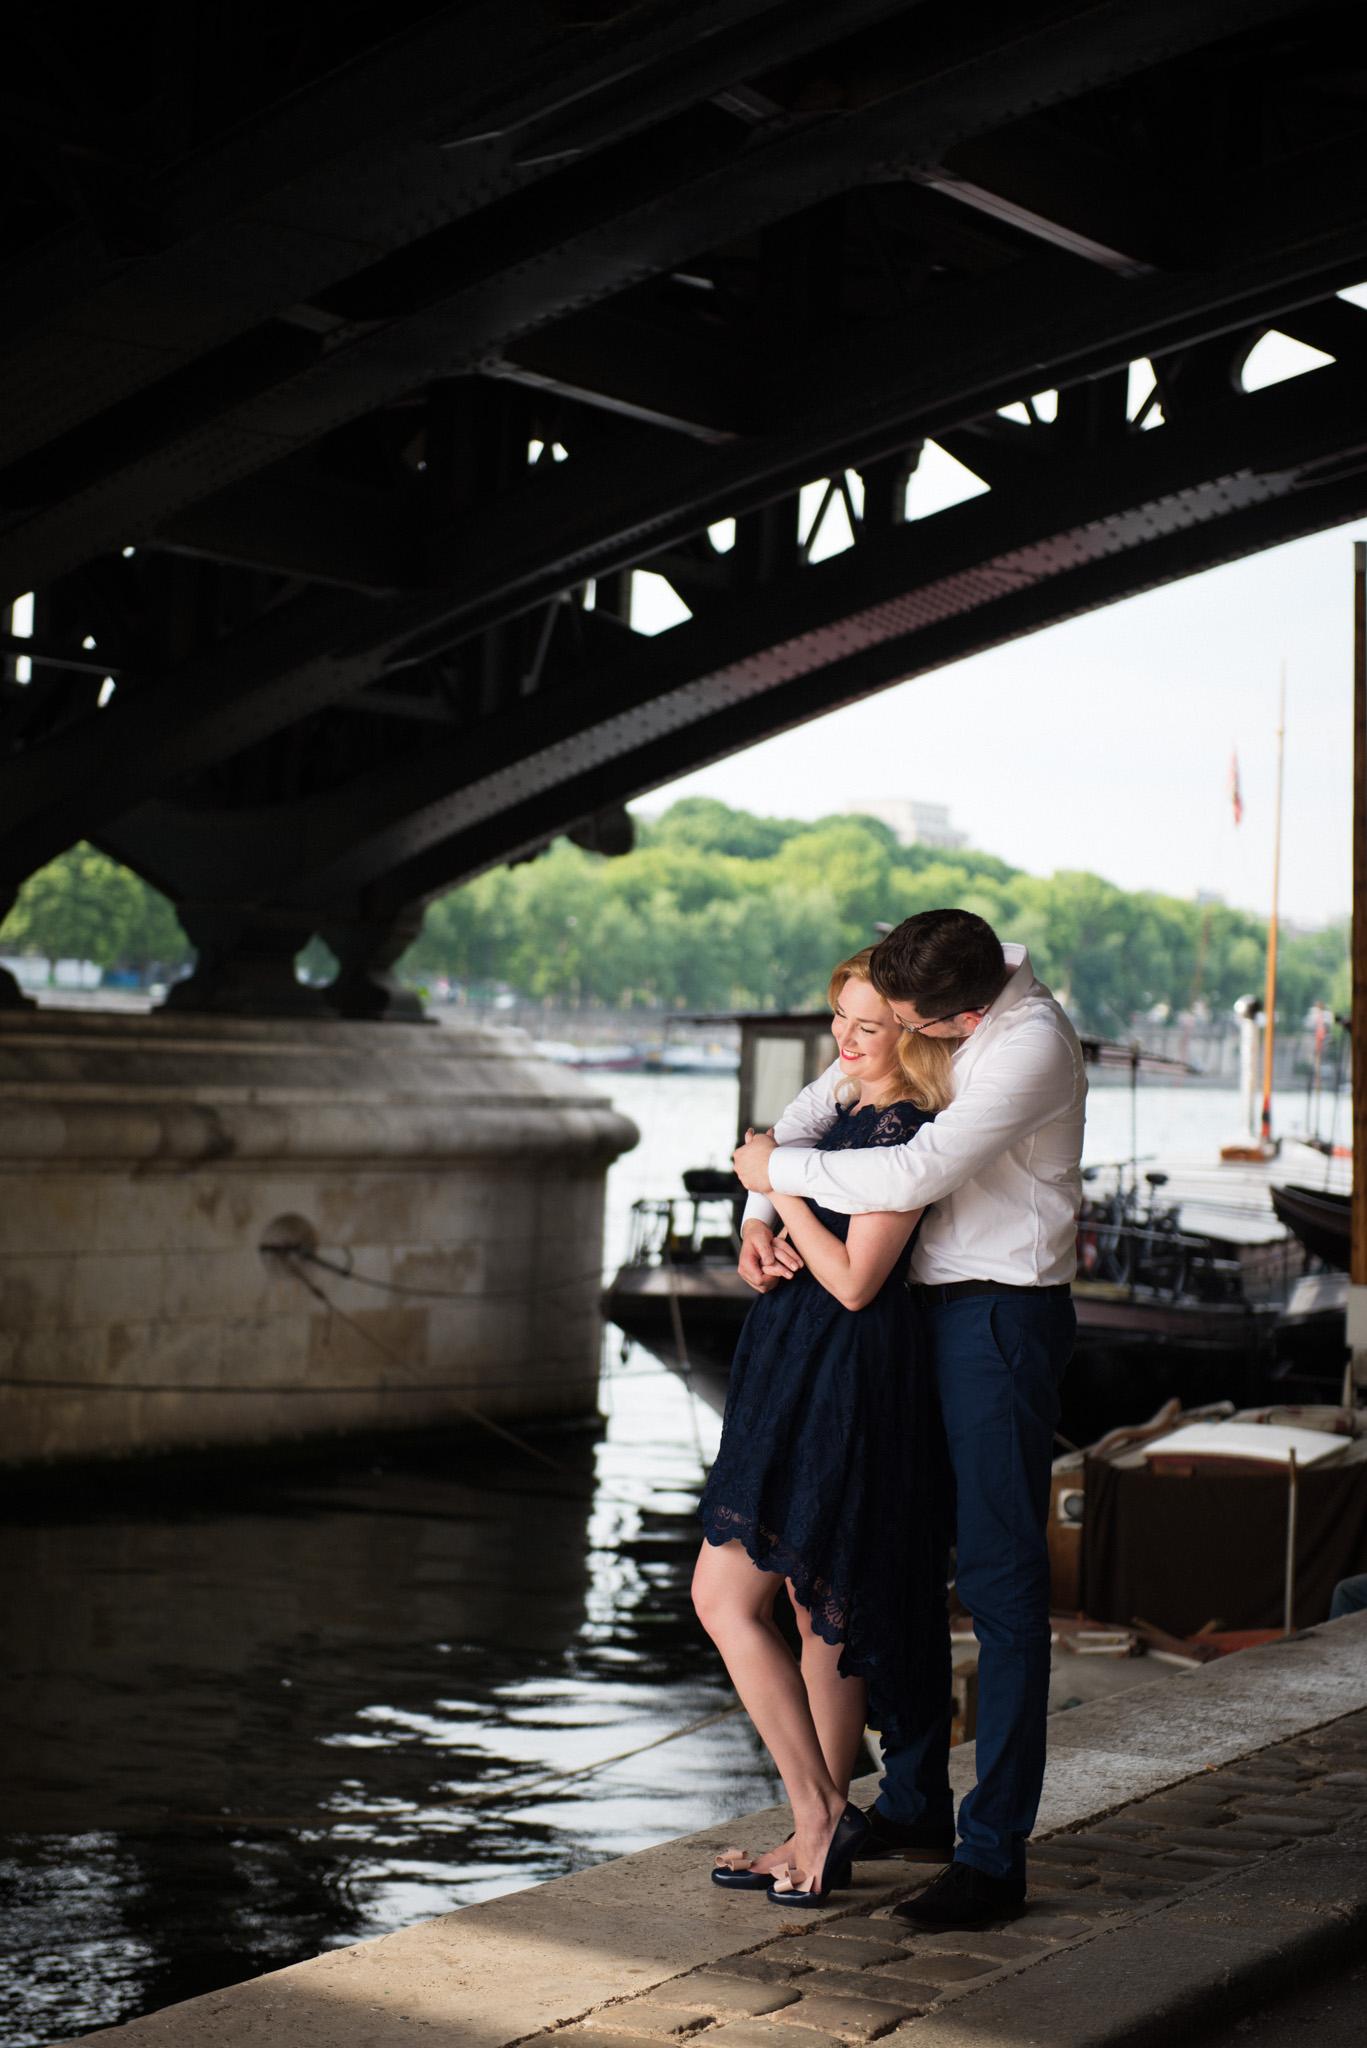 Surprise Proposal Photo Session in Paris by Paris Photographer Shantha Delaunay.jpg